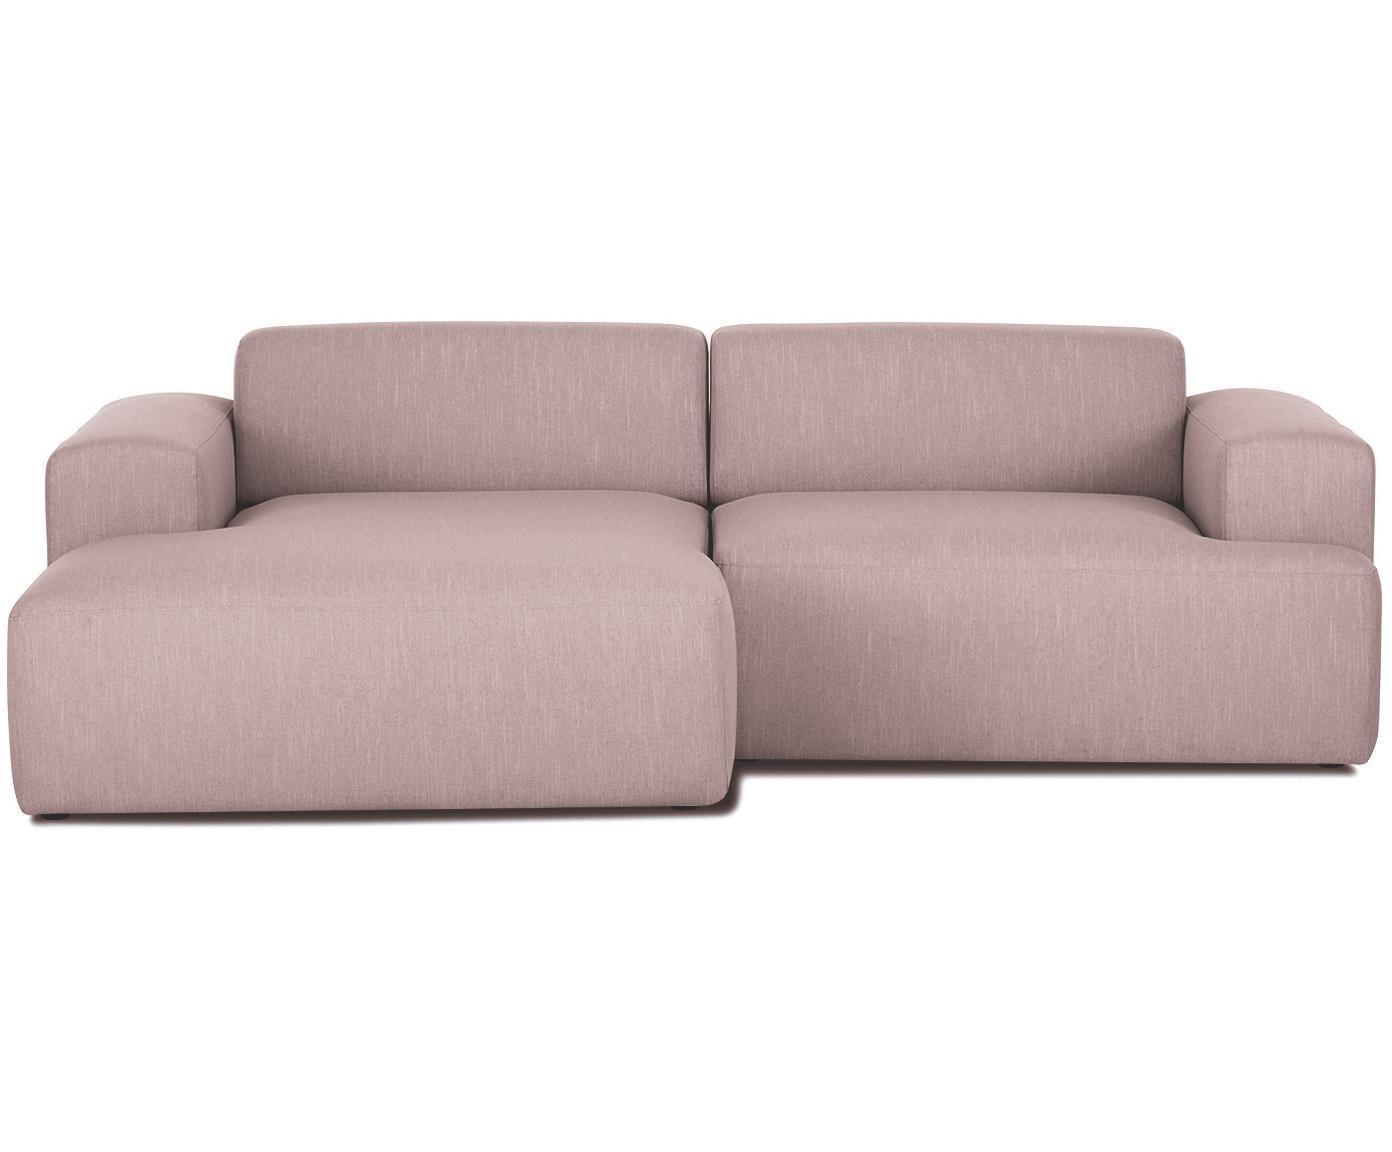 Ecksofa Melva (3-Sitzer), Bezug: Polyester 35.000 Scheuert, Gestell: Massives Kiefernholz, Spa, Füße: Kiefernholz, Webstoff Rosa, B 240 x T 144 cm